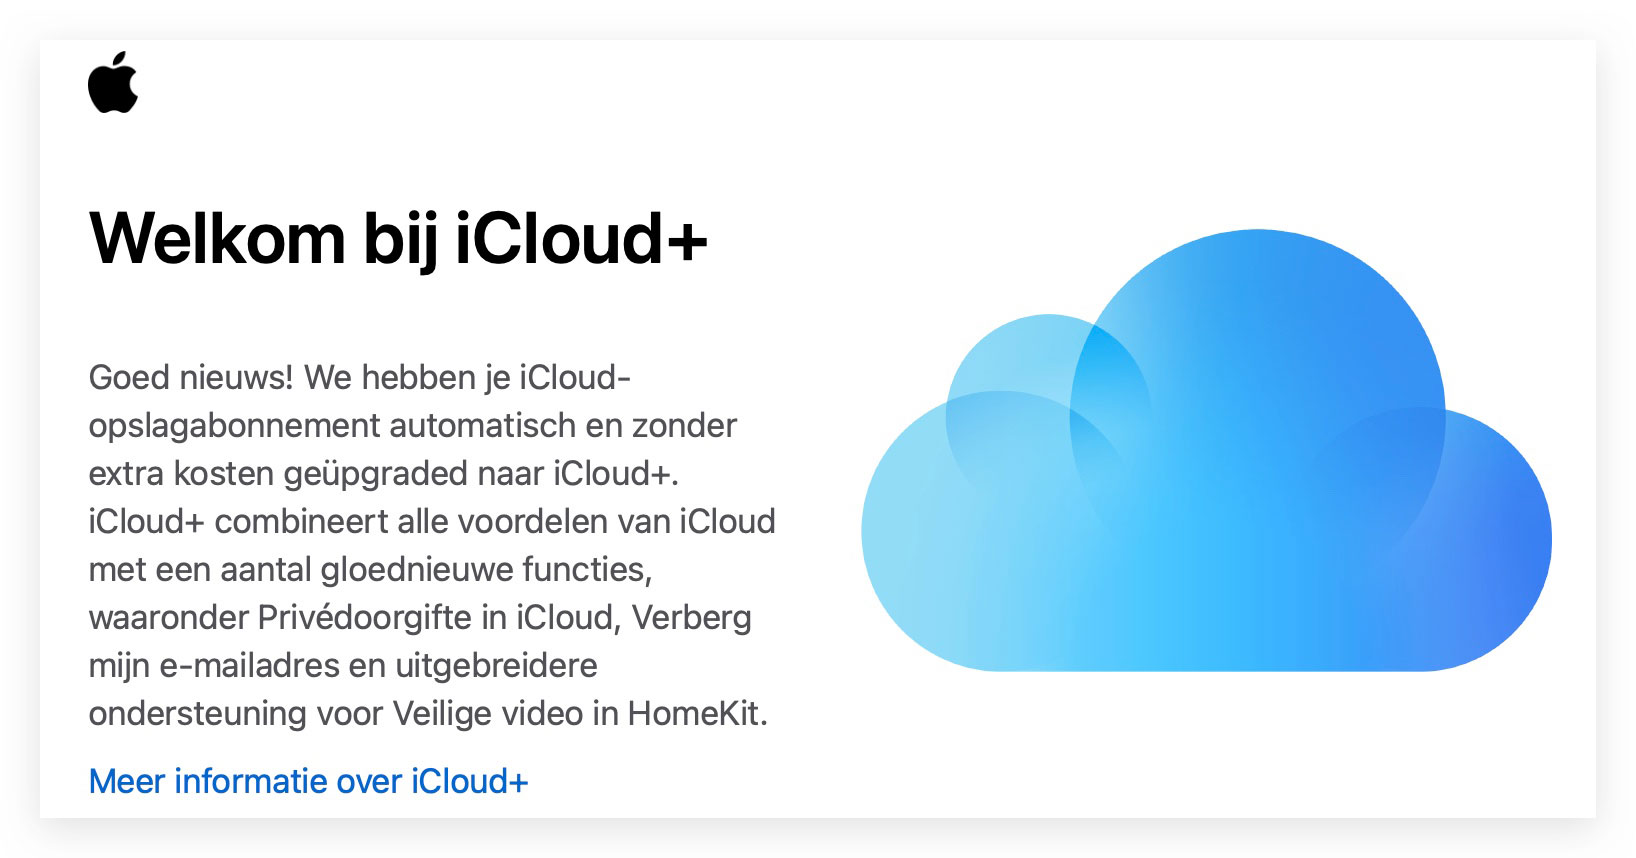 https://www.macfreak.nl/modules/news/images/zArt.iCloudPlus-1.jpg